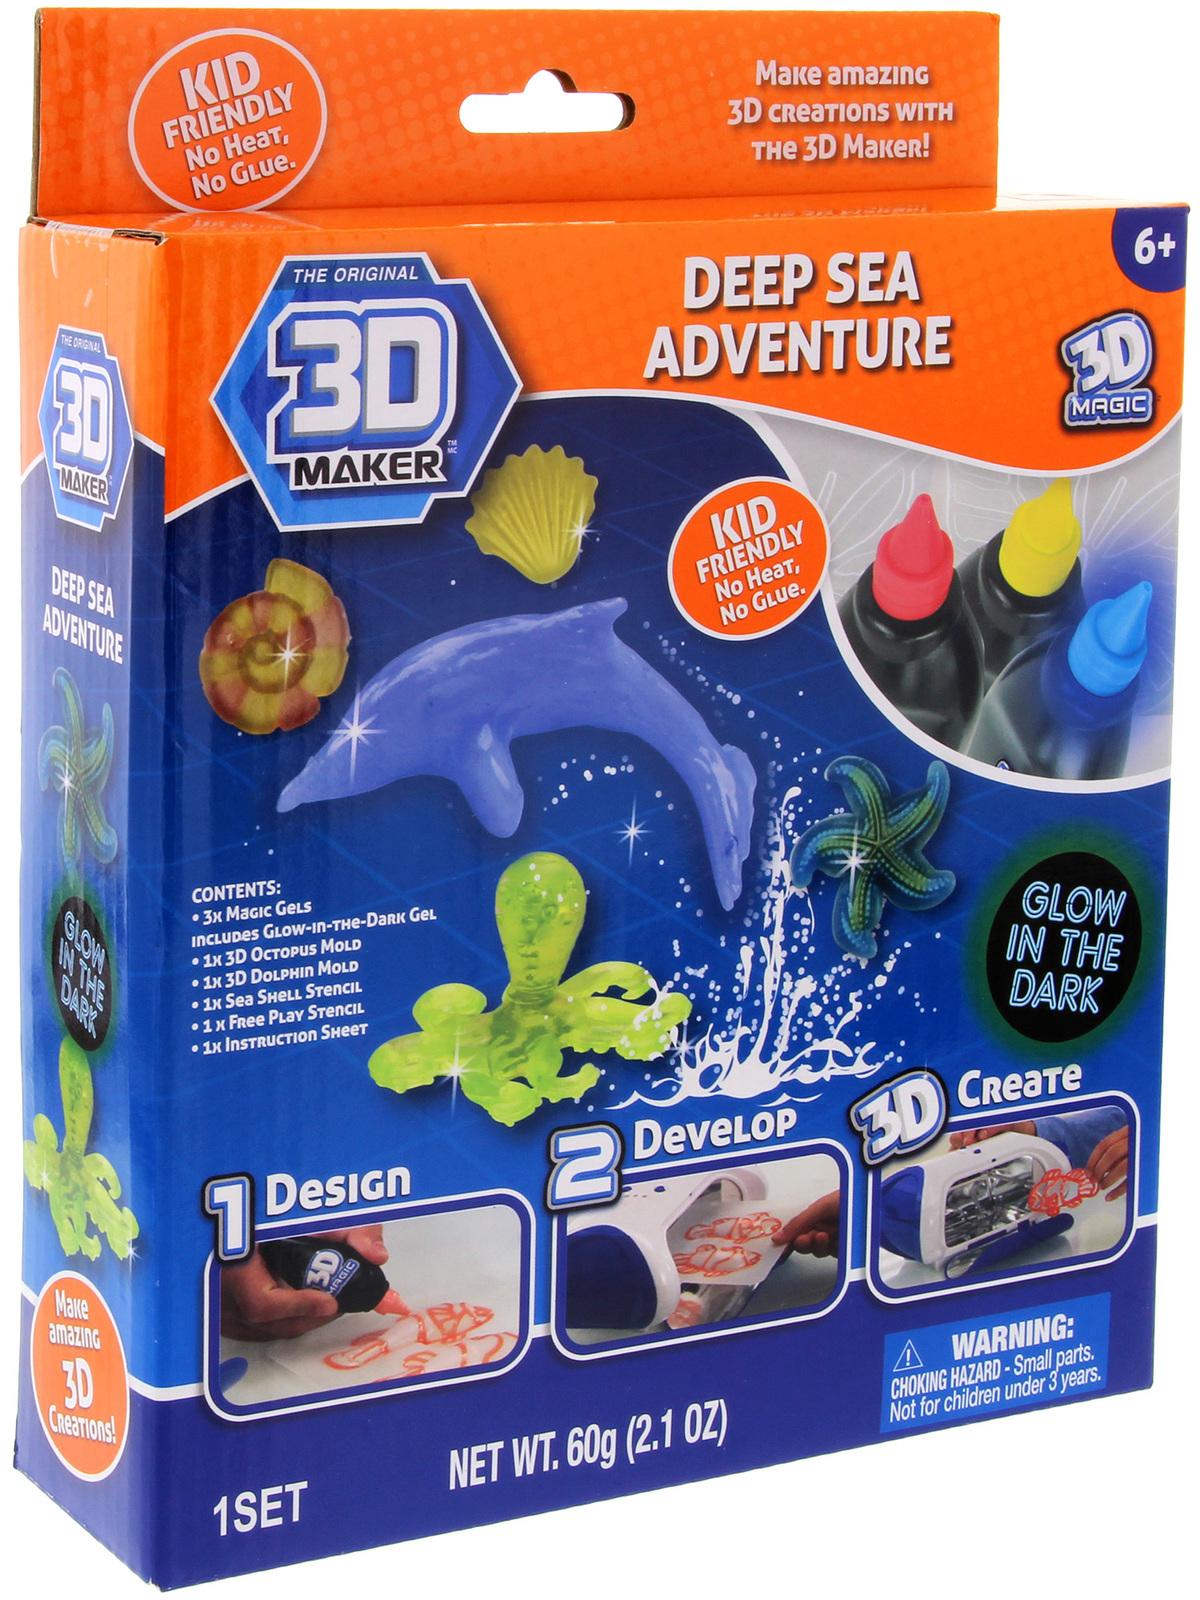 3D Magic: Glow in the Dark Set - Deep Sea Adventure image